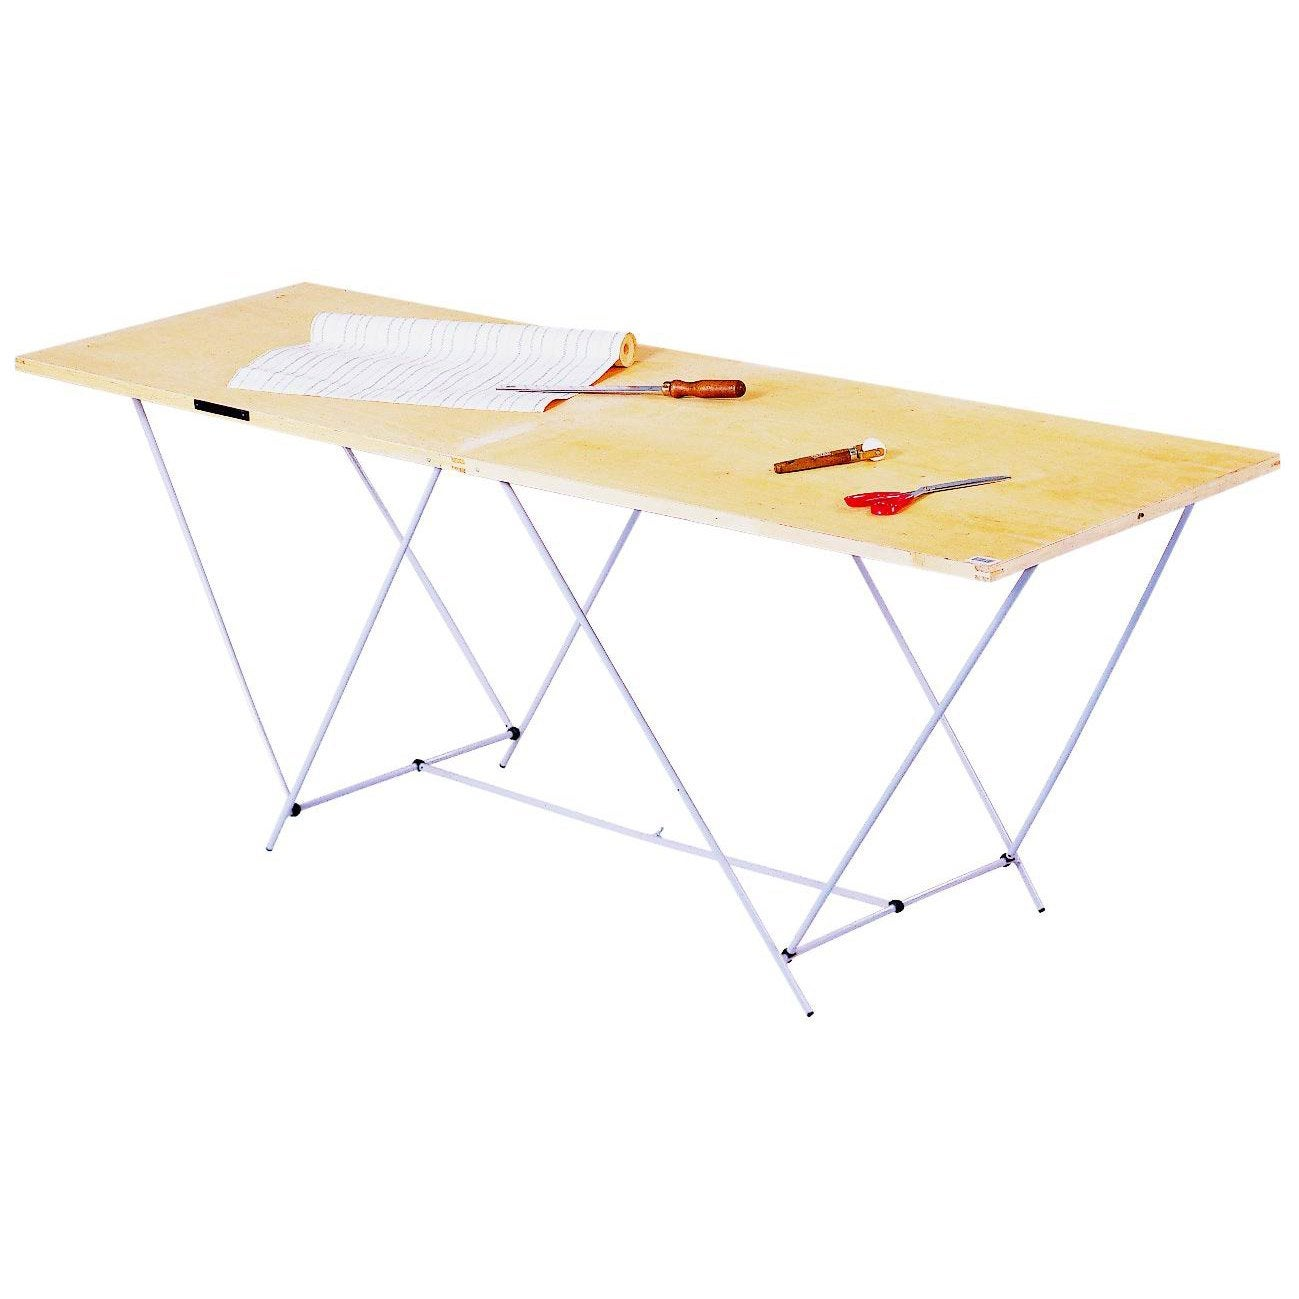 table tapisser pliante ocai 60 cm x 2 m leroy merlin